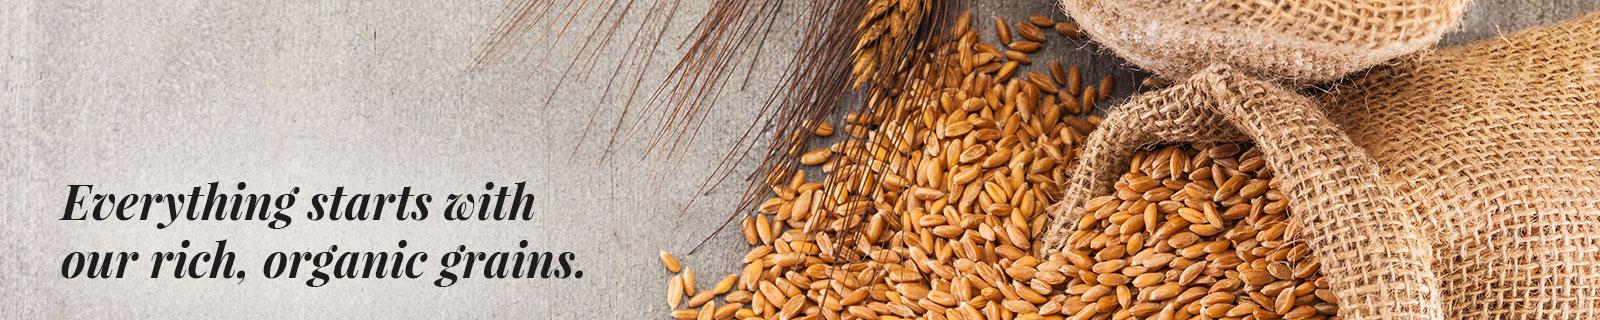 grain heading image